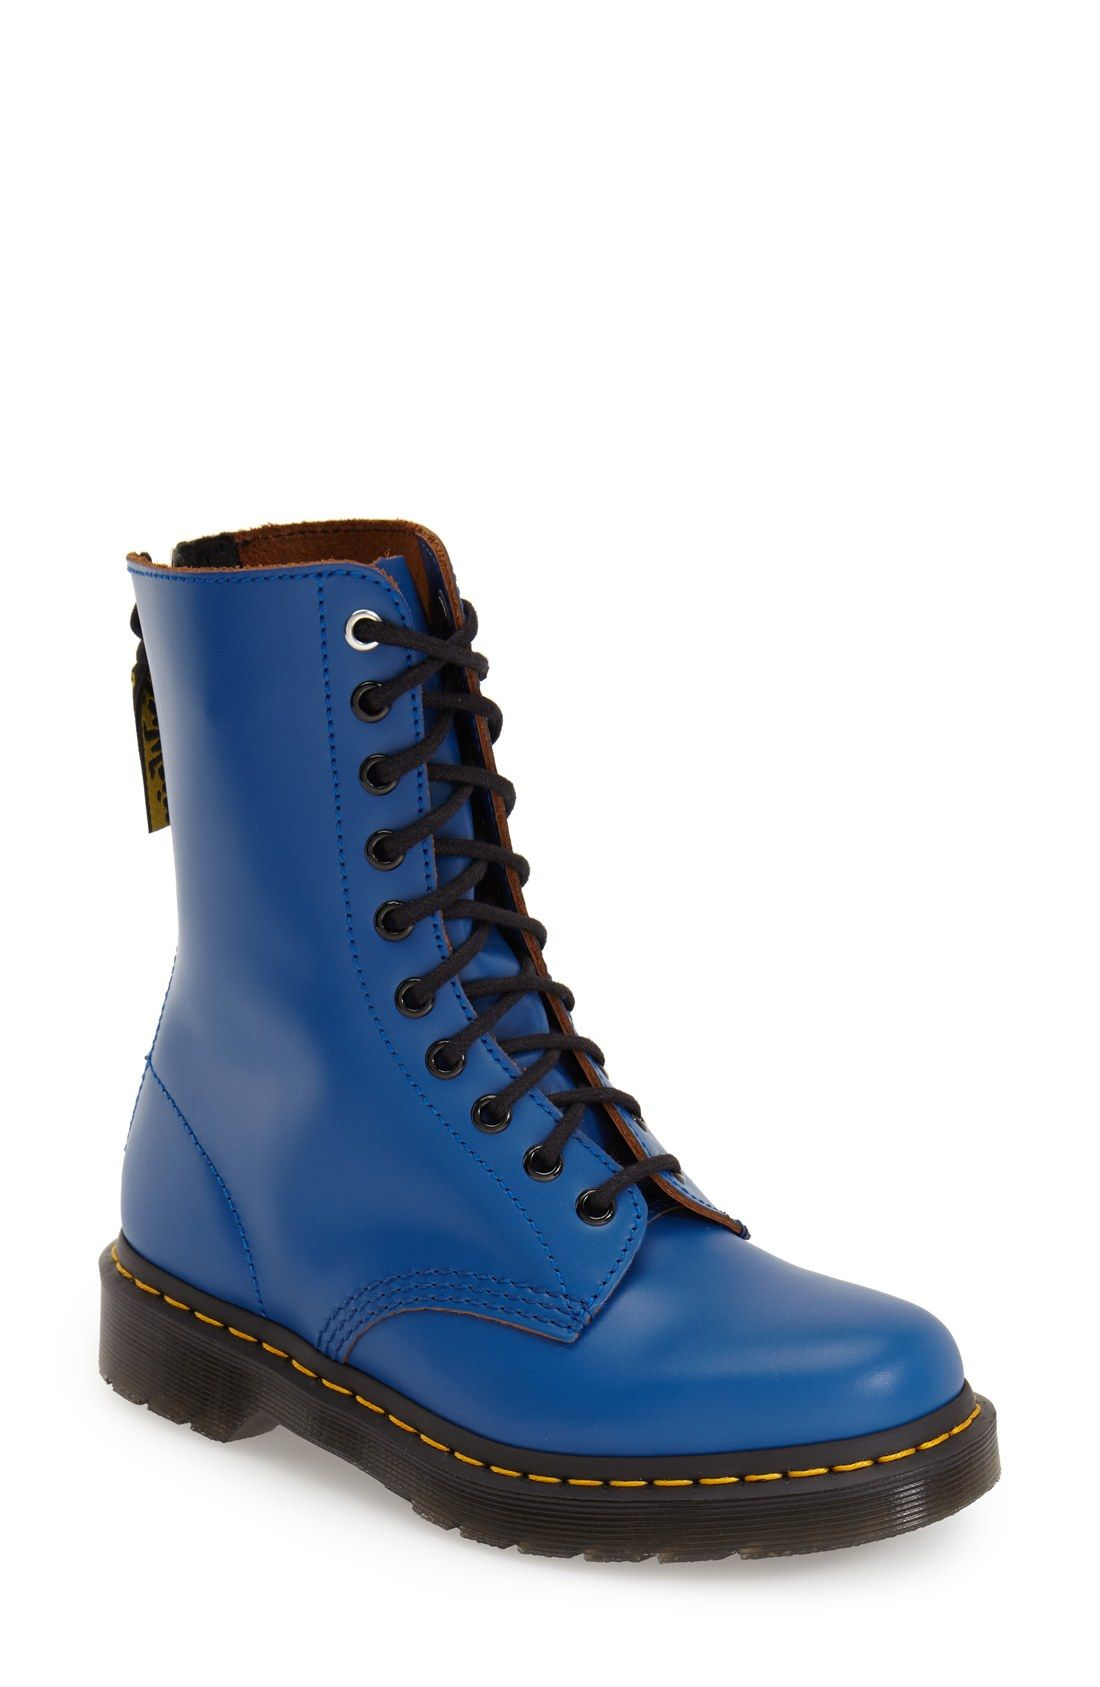 Y s by Yohji Yamamoto Dr. Martens Boot (Women)  1ad8656e8